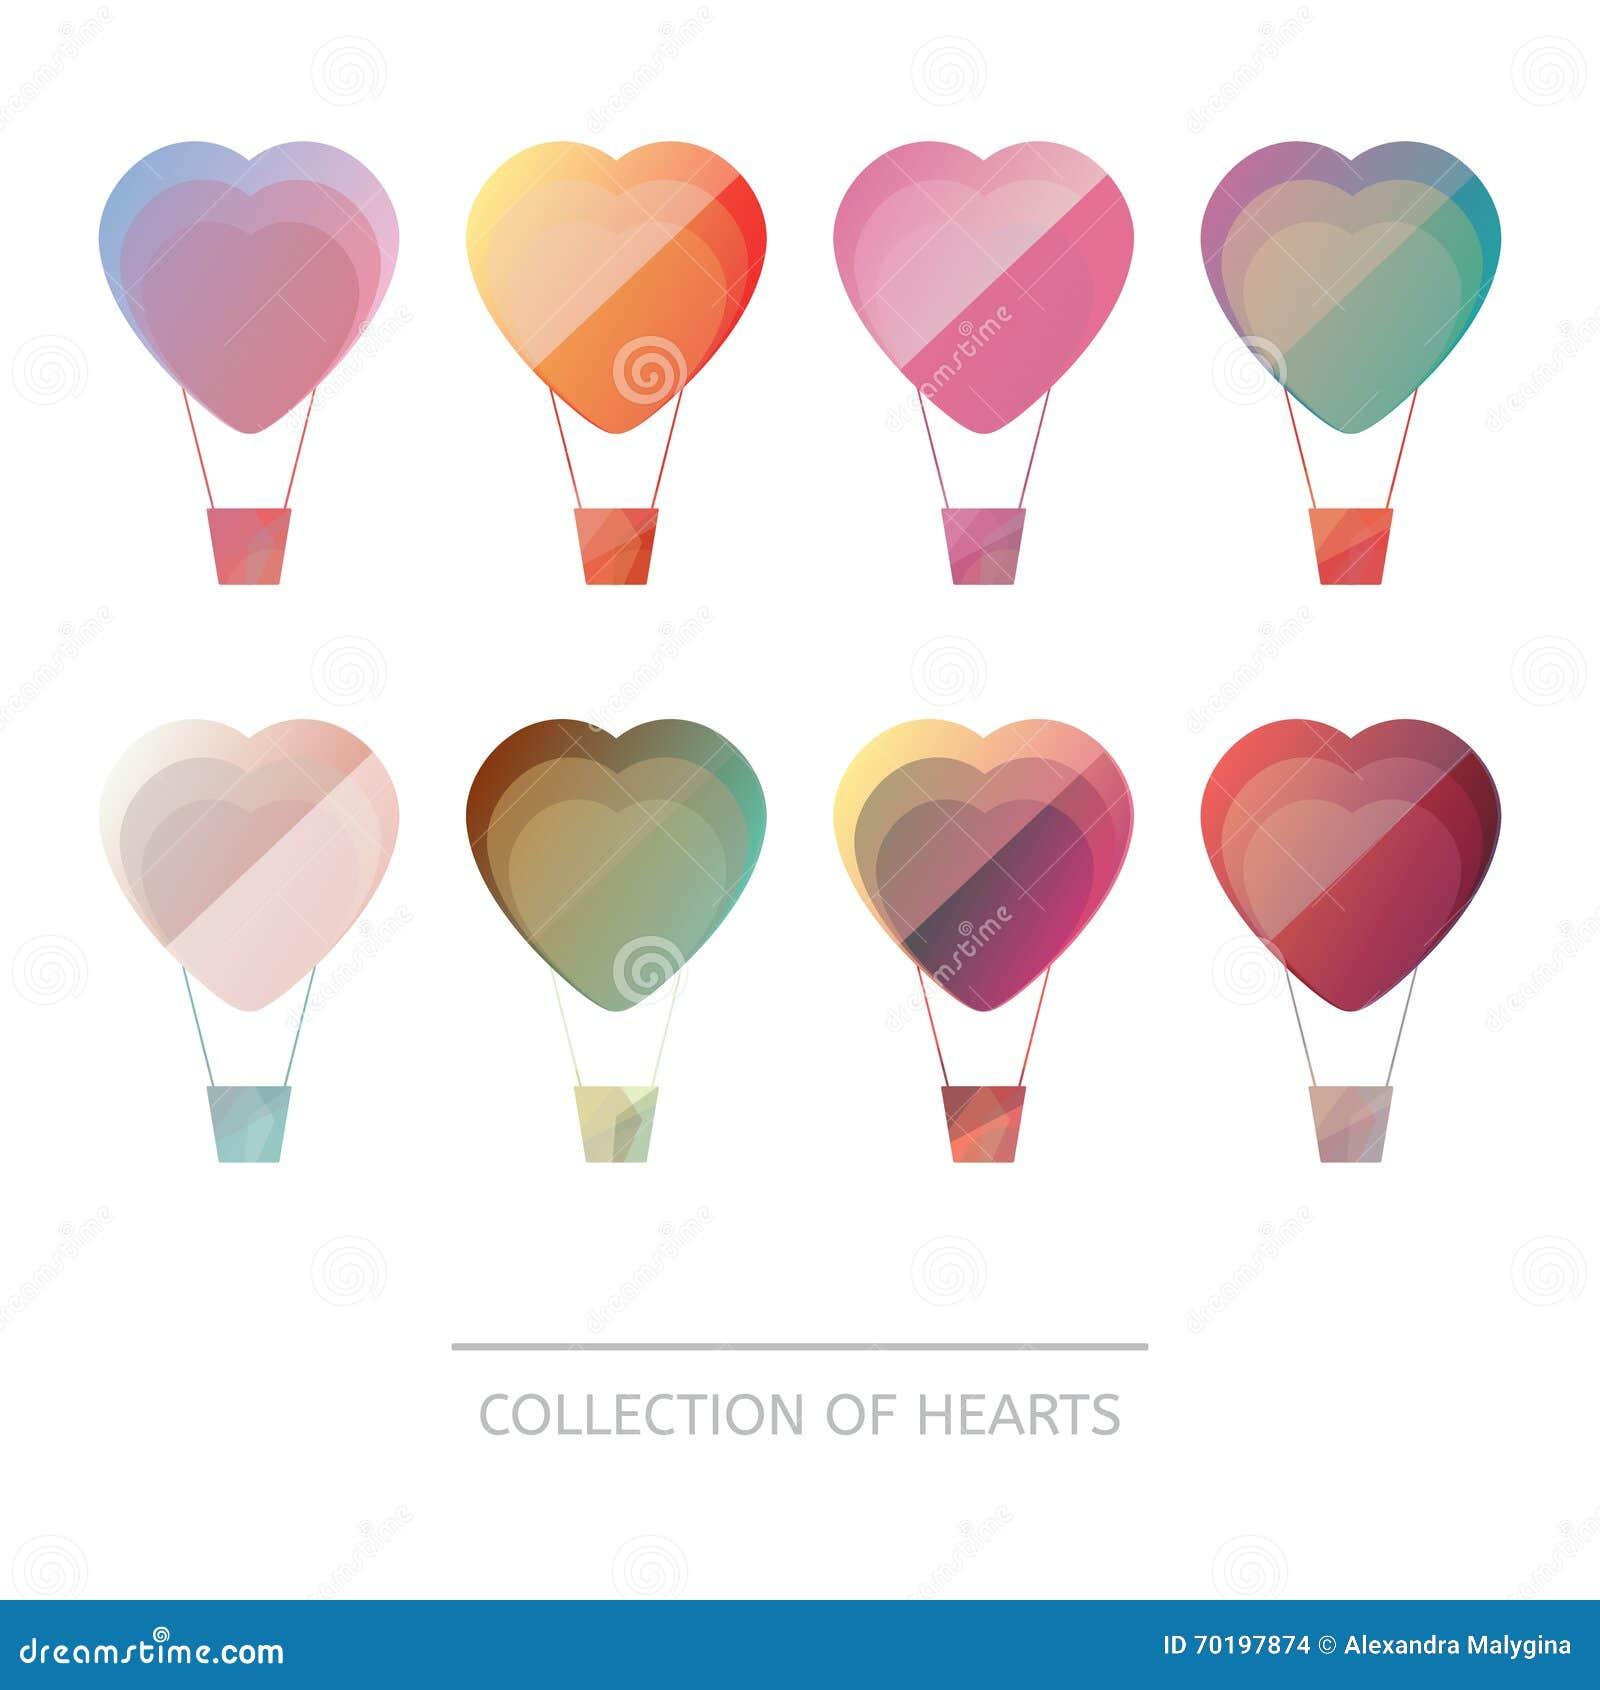 Premium colorful set of geometric balloons hearts